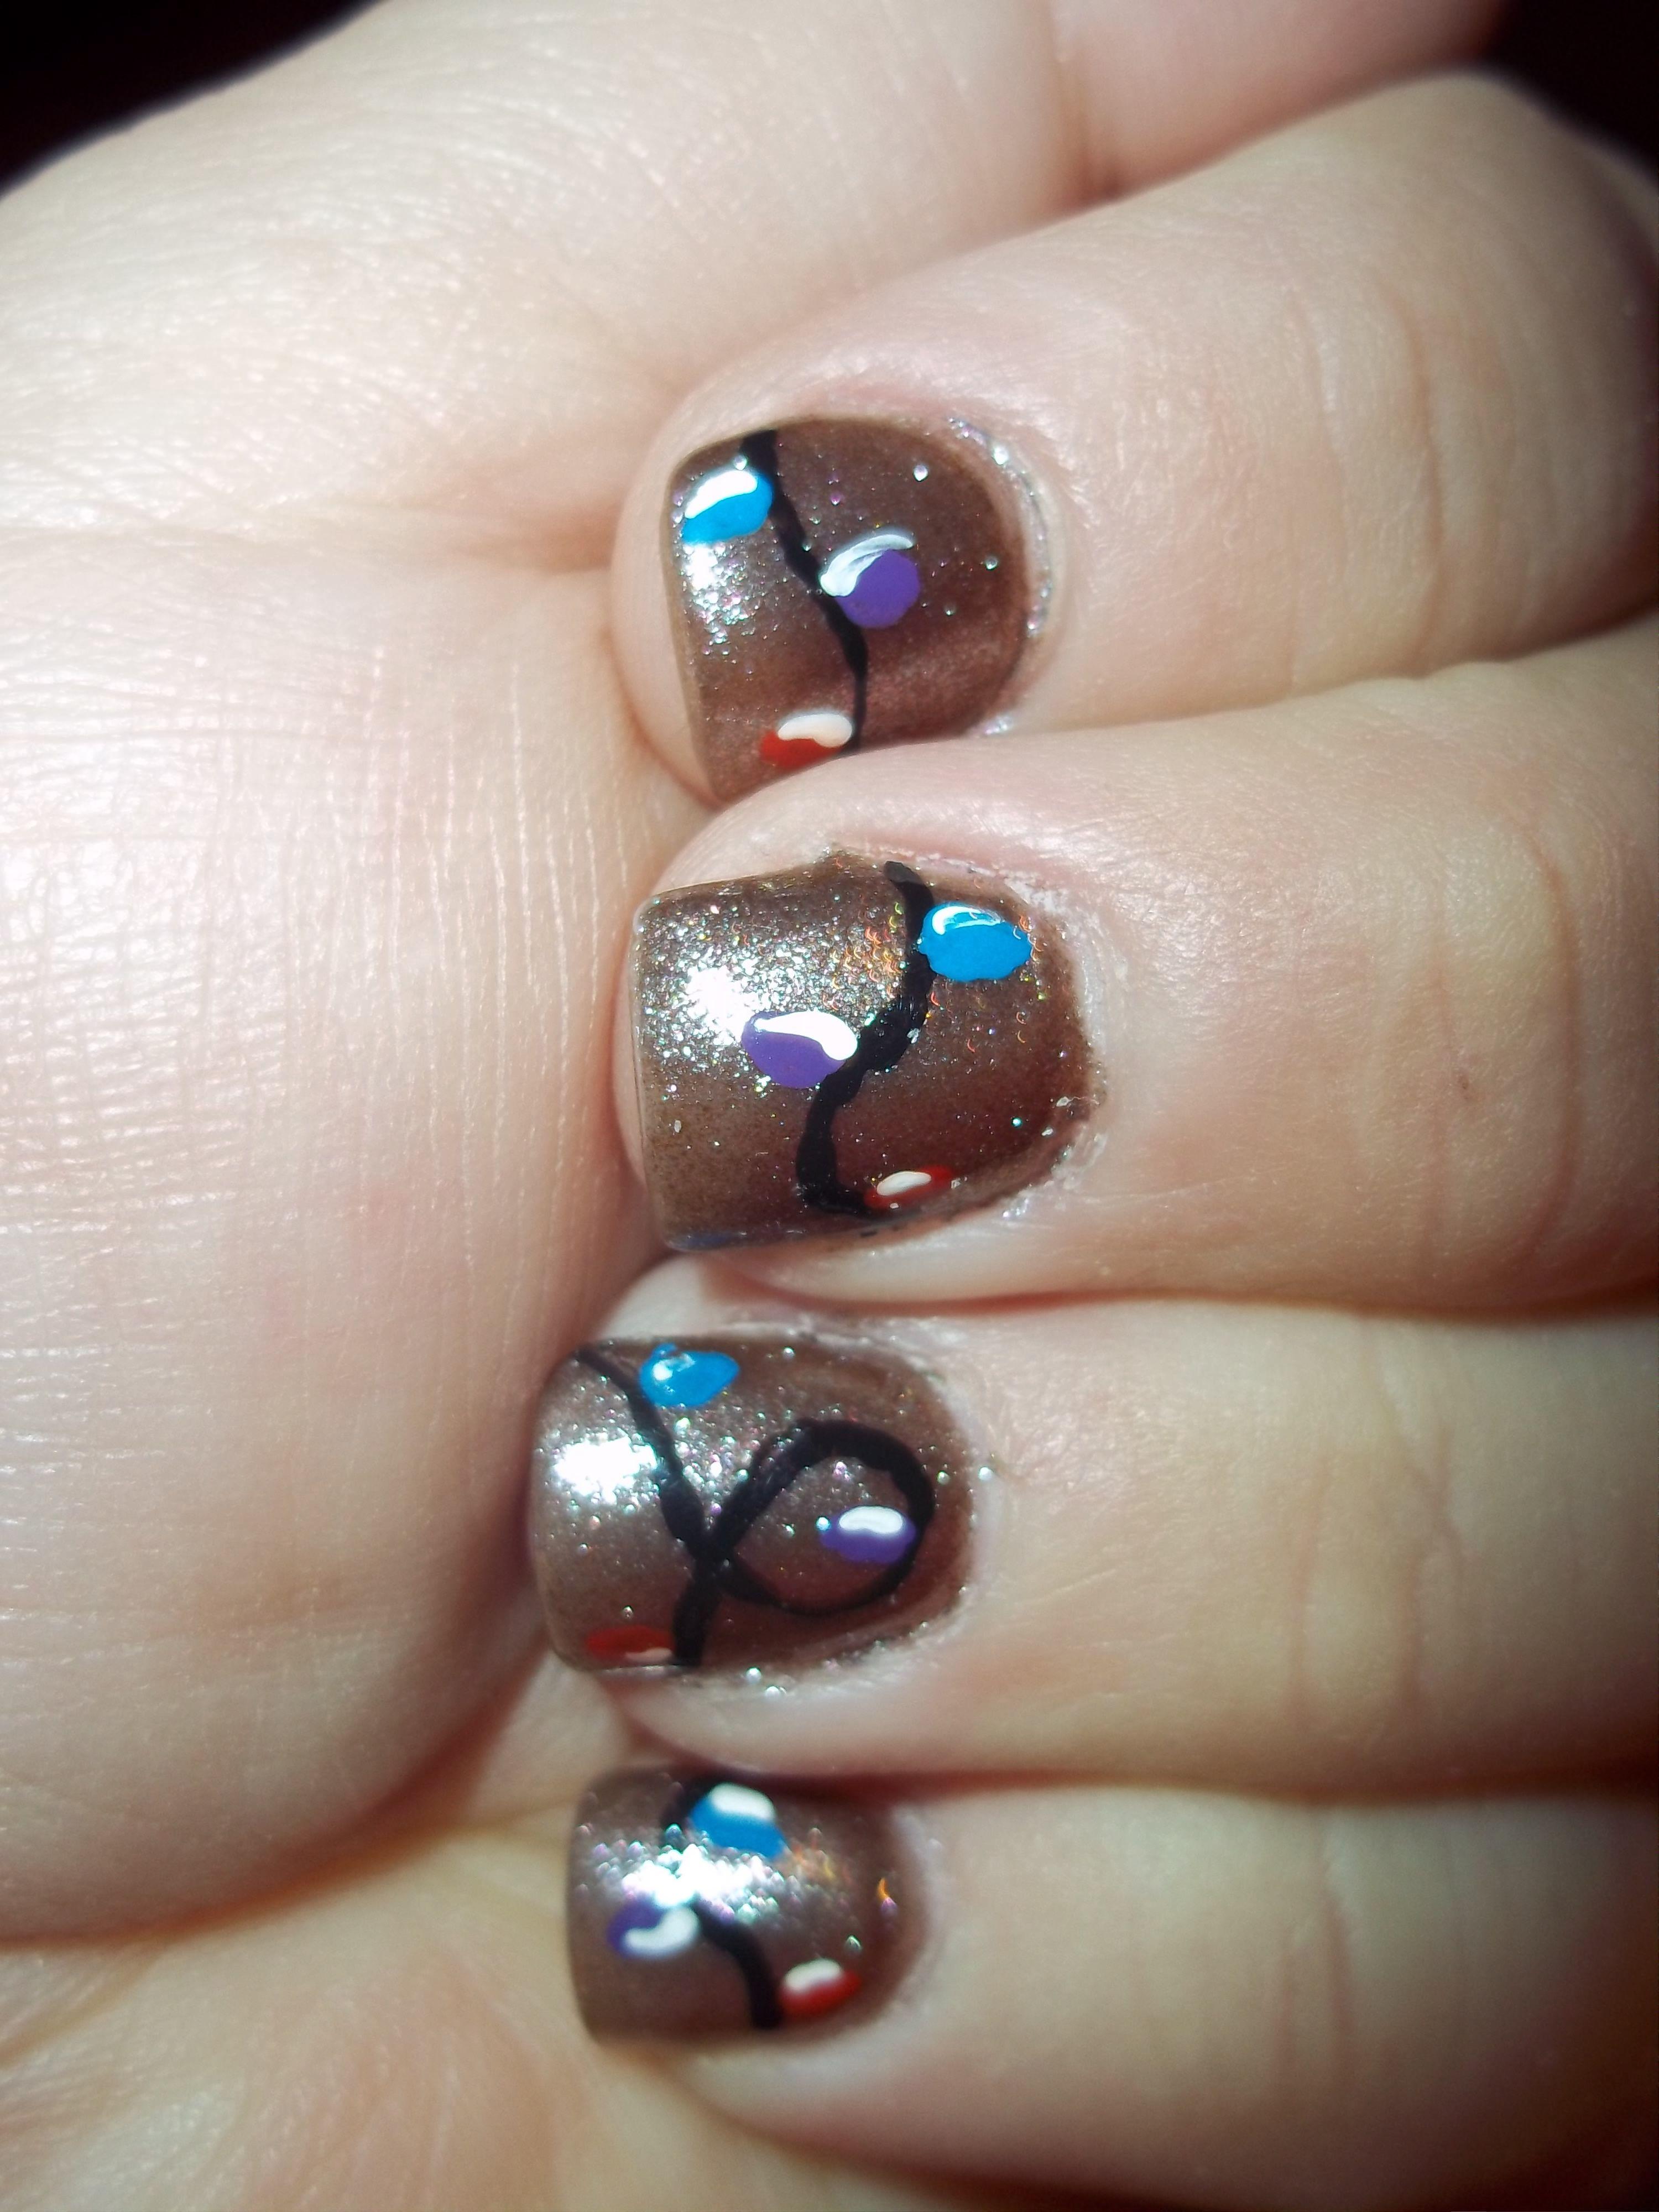 Art Nails Rochester Ny Hours – Papillon Day Spa